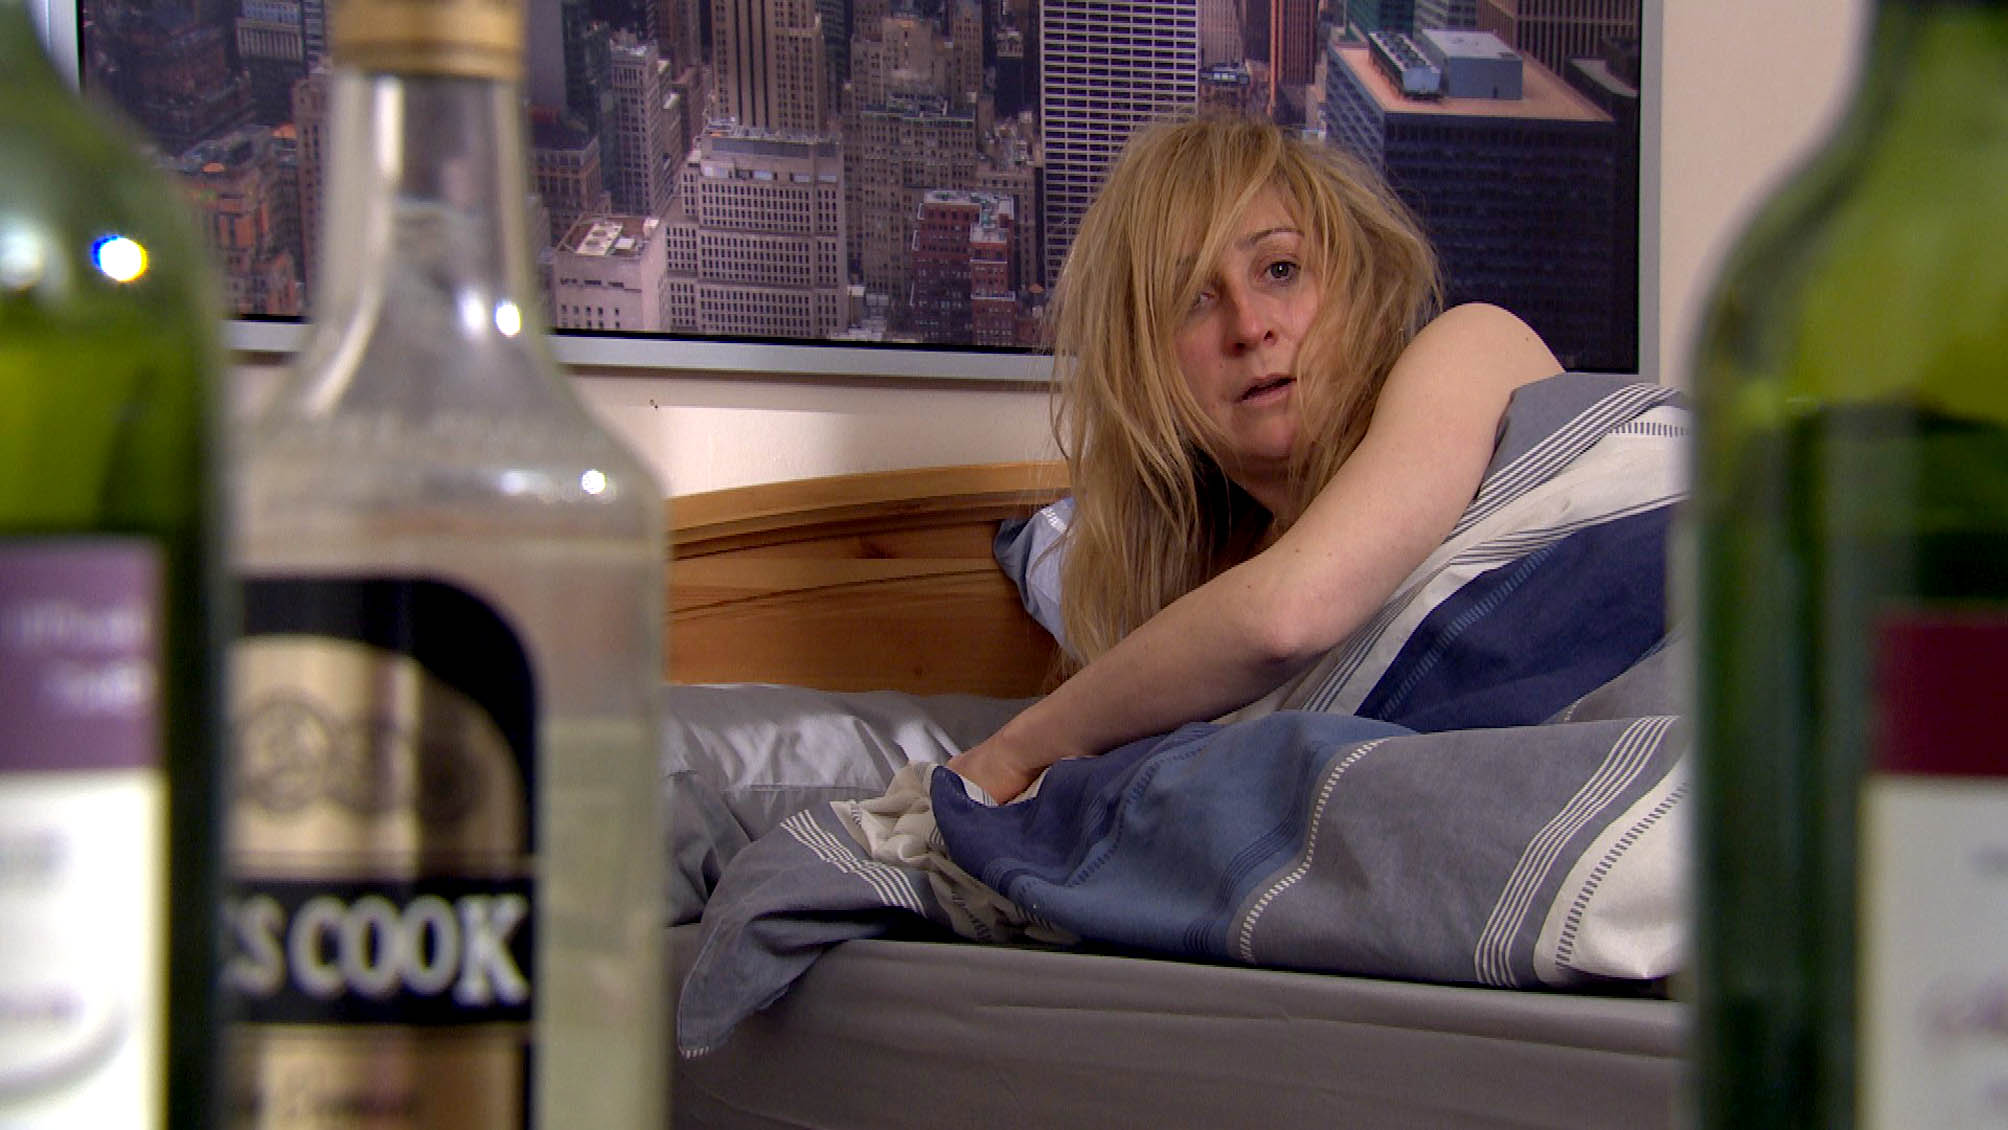 Emmerdale spoilers: Laurel Dingle sinks to her lowest point yet in shock story twist